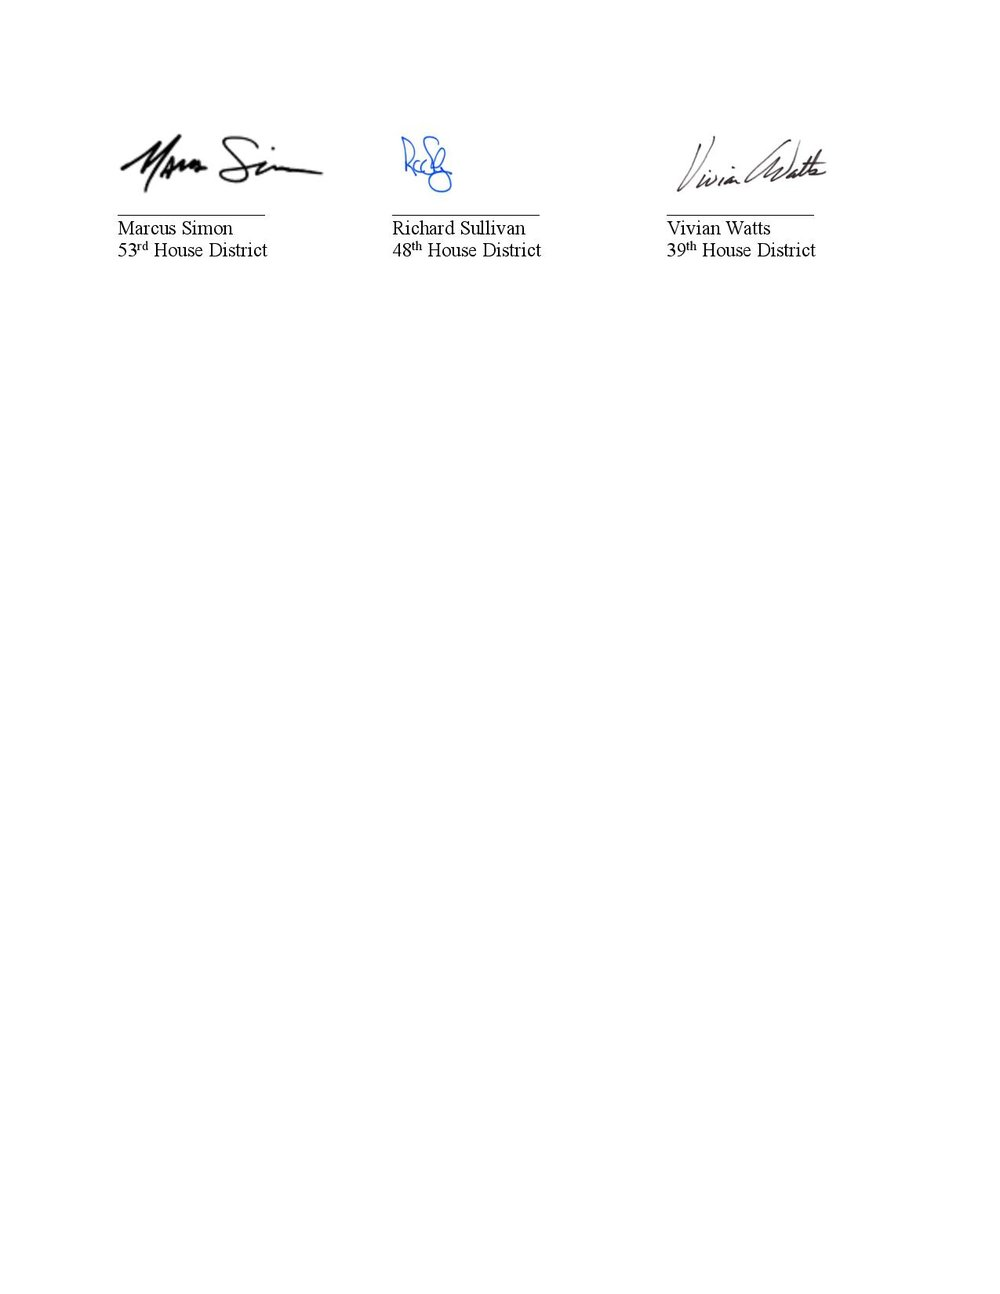 KT Census Letter-page-004.jpg